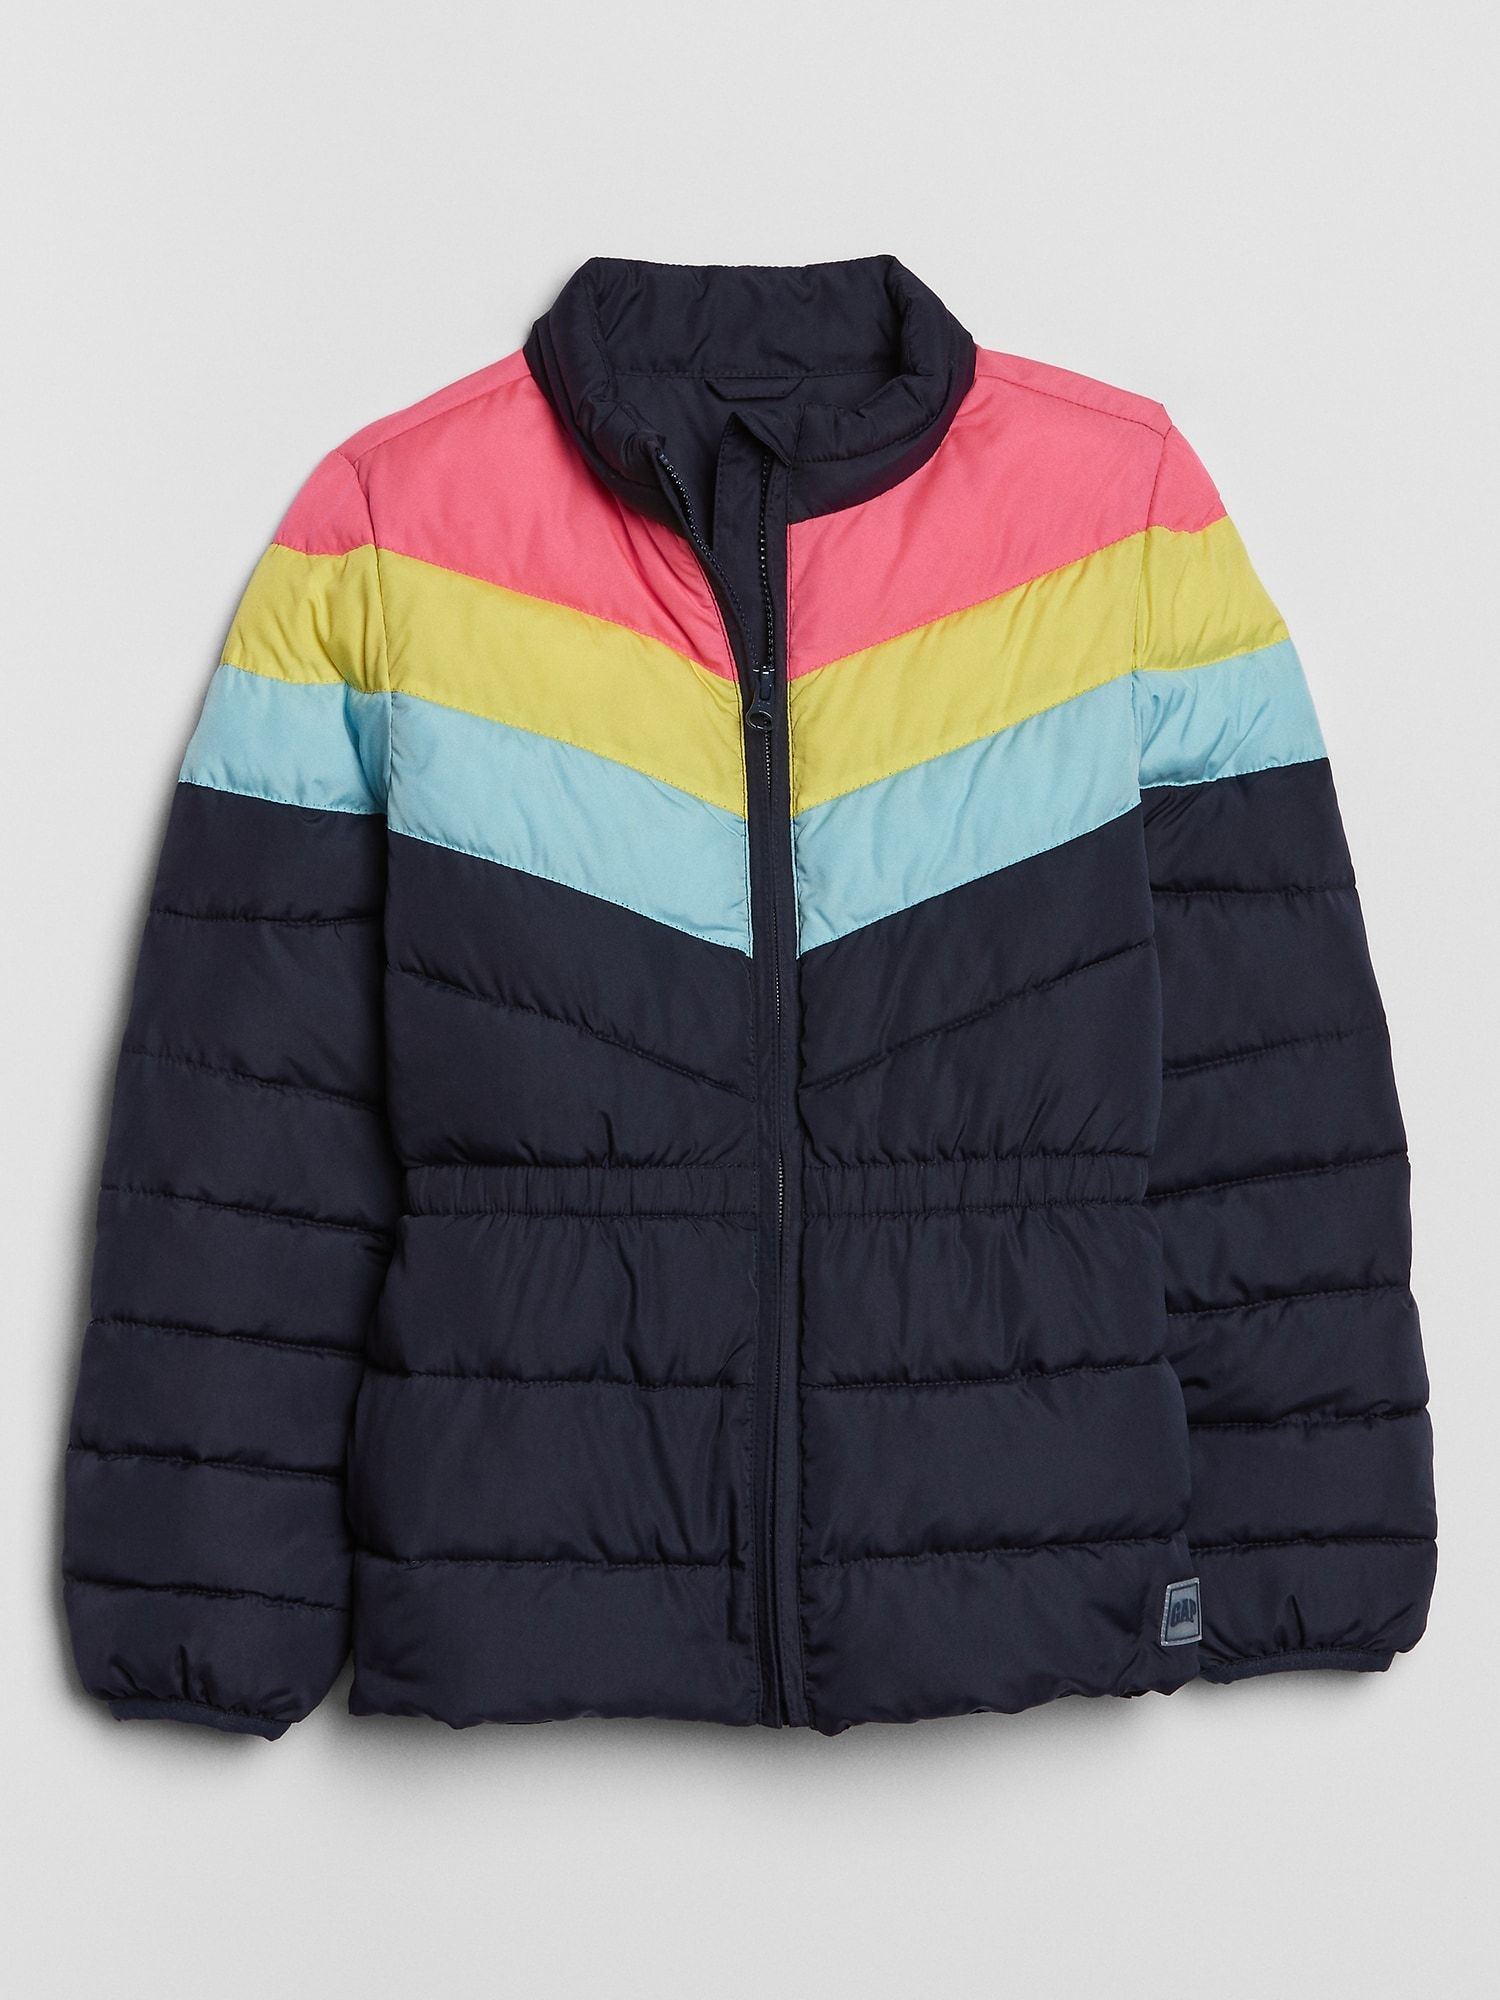 Kids Colorblock Puffer Jacket Gap Factory Jackets Puffer Jackets Winter Jackets [ 2000 x 1500 Pixel ]